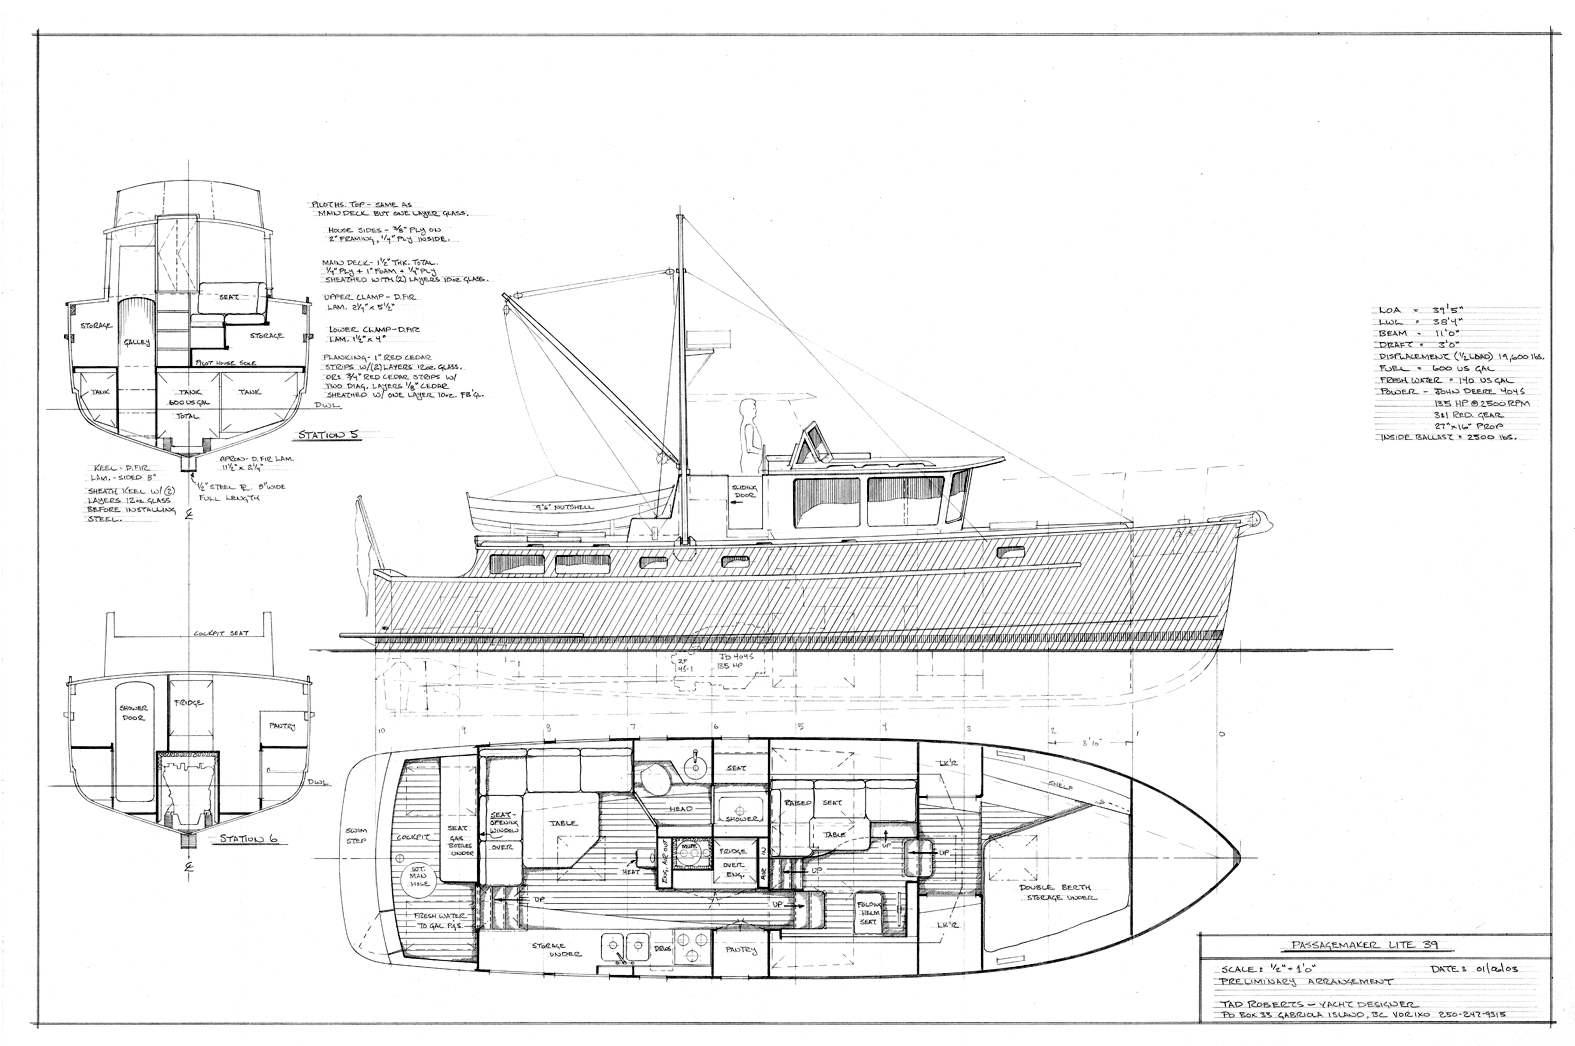 Passagemaker lite 39 tad roberts fast seaworthy fuel efficient passagemaker lite 39 malvernweather Choice Image